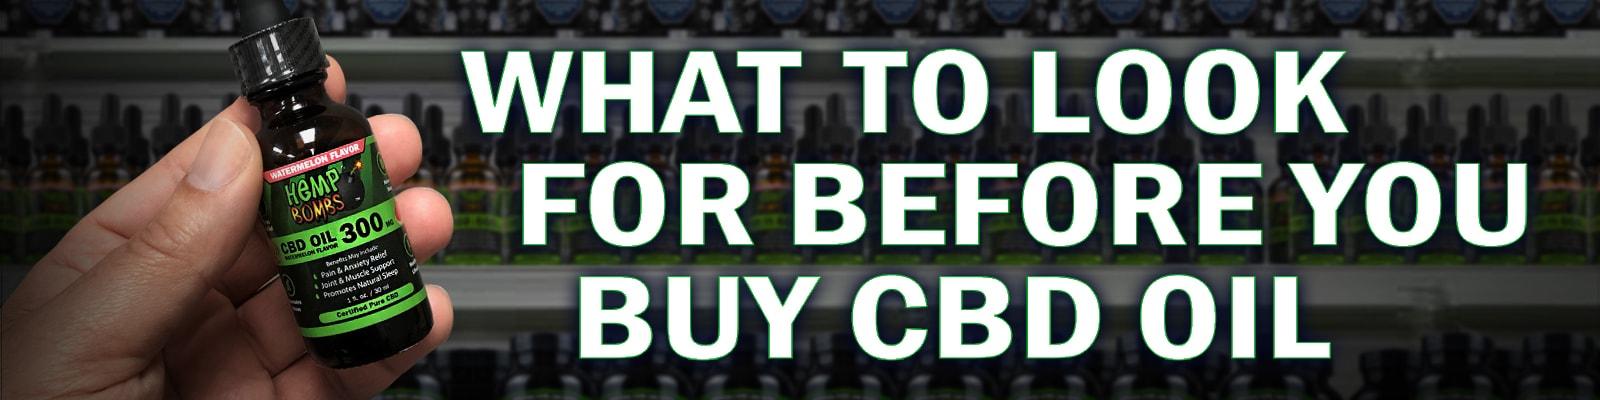 Before You Buy CBD Oil Checklist